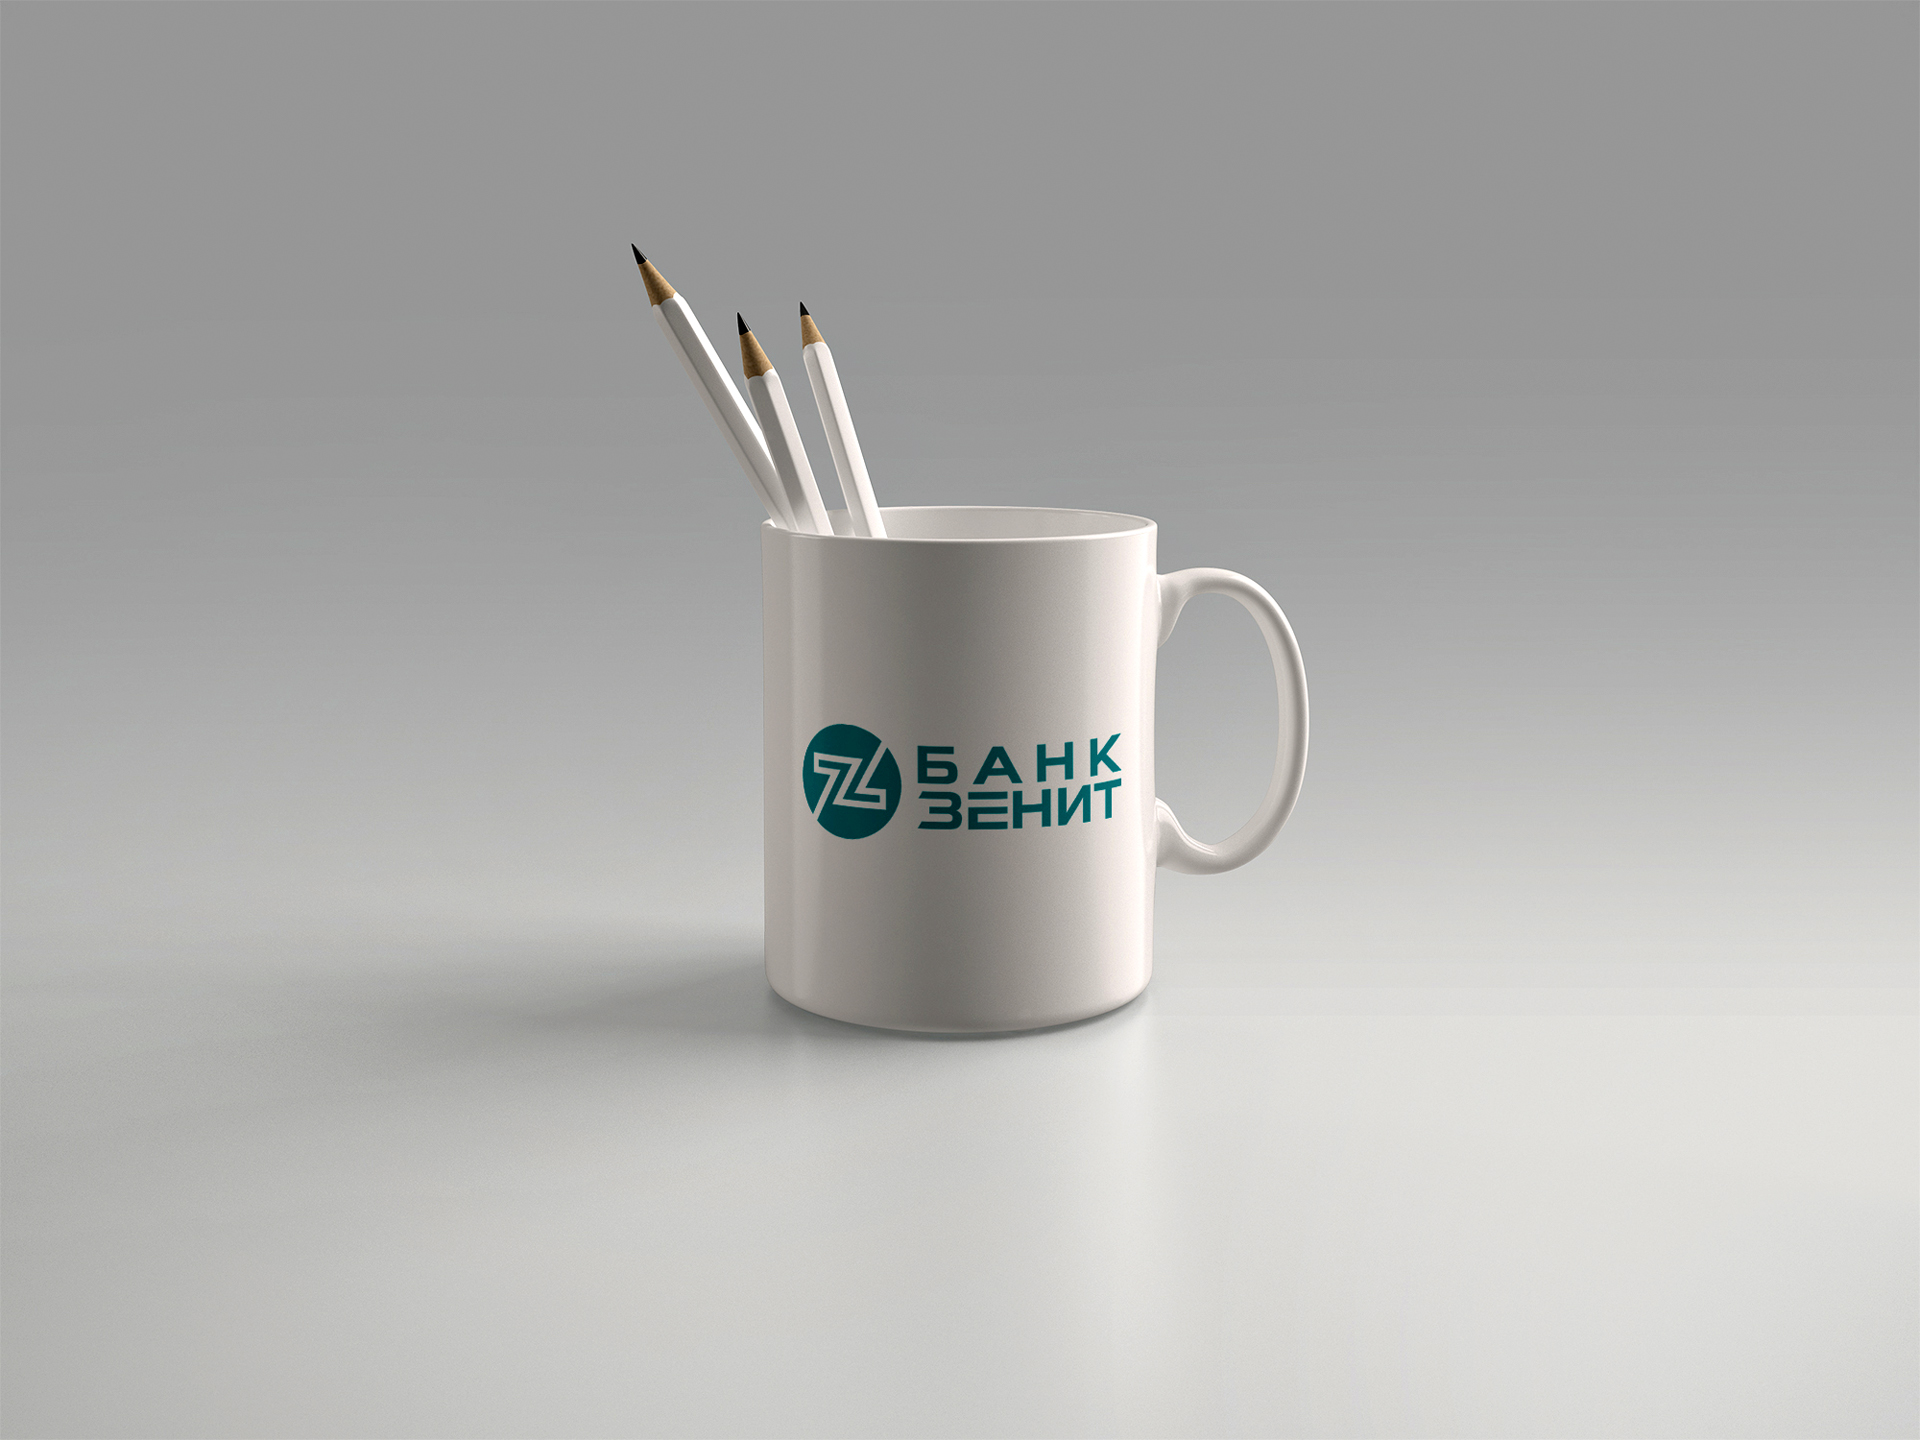 Разработка логотипа для Банка ЗЕНИТ фото f_1755b4c84db8c1fc.jpg